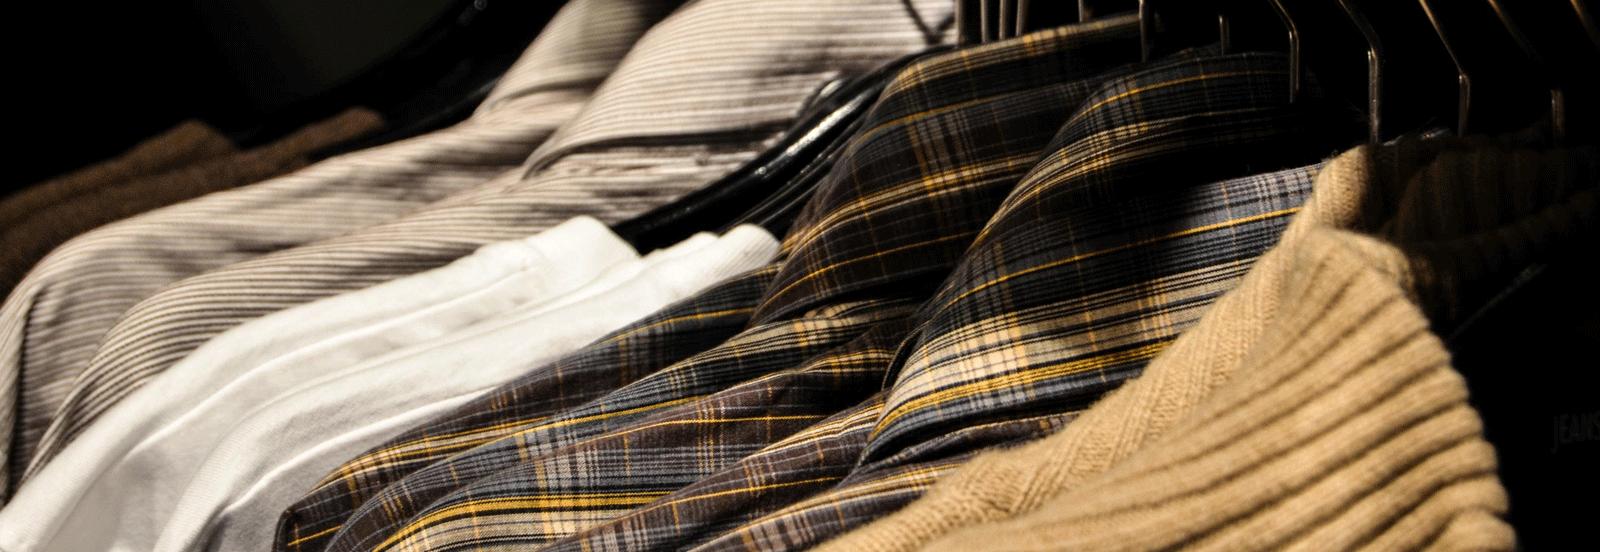 Spare Clothes